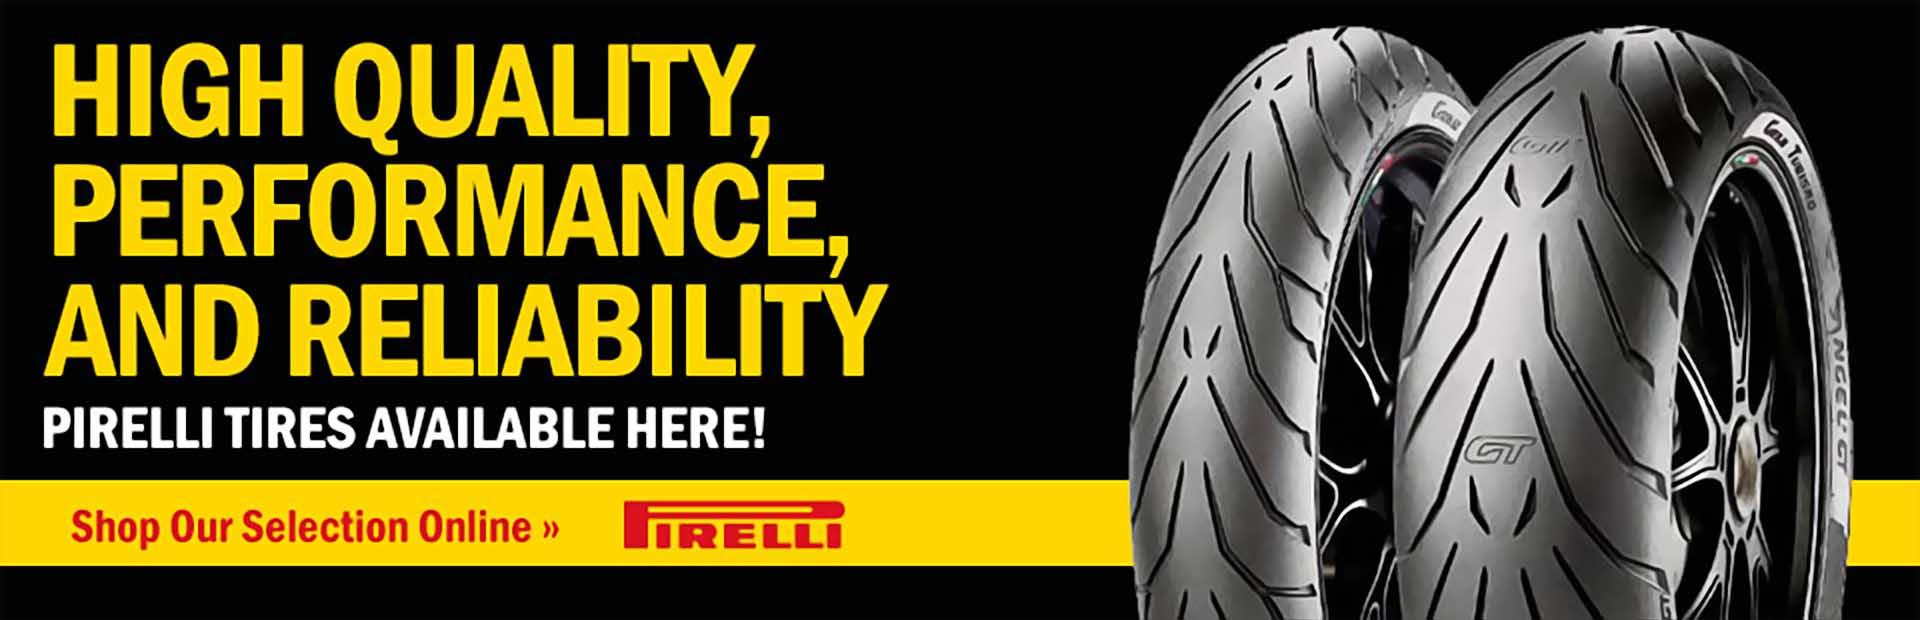 View Pirelli tires online.